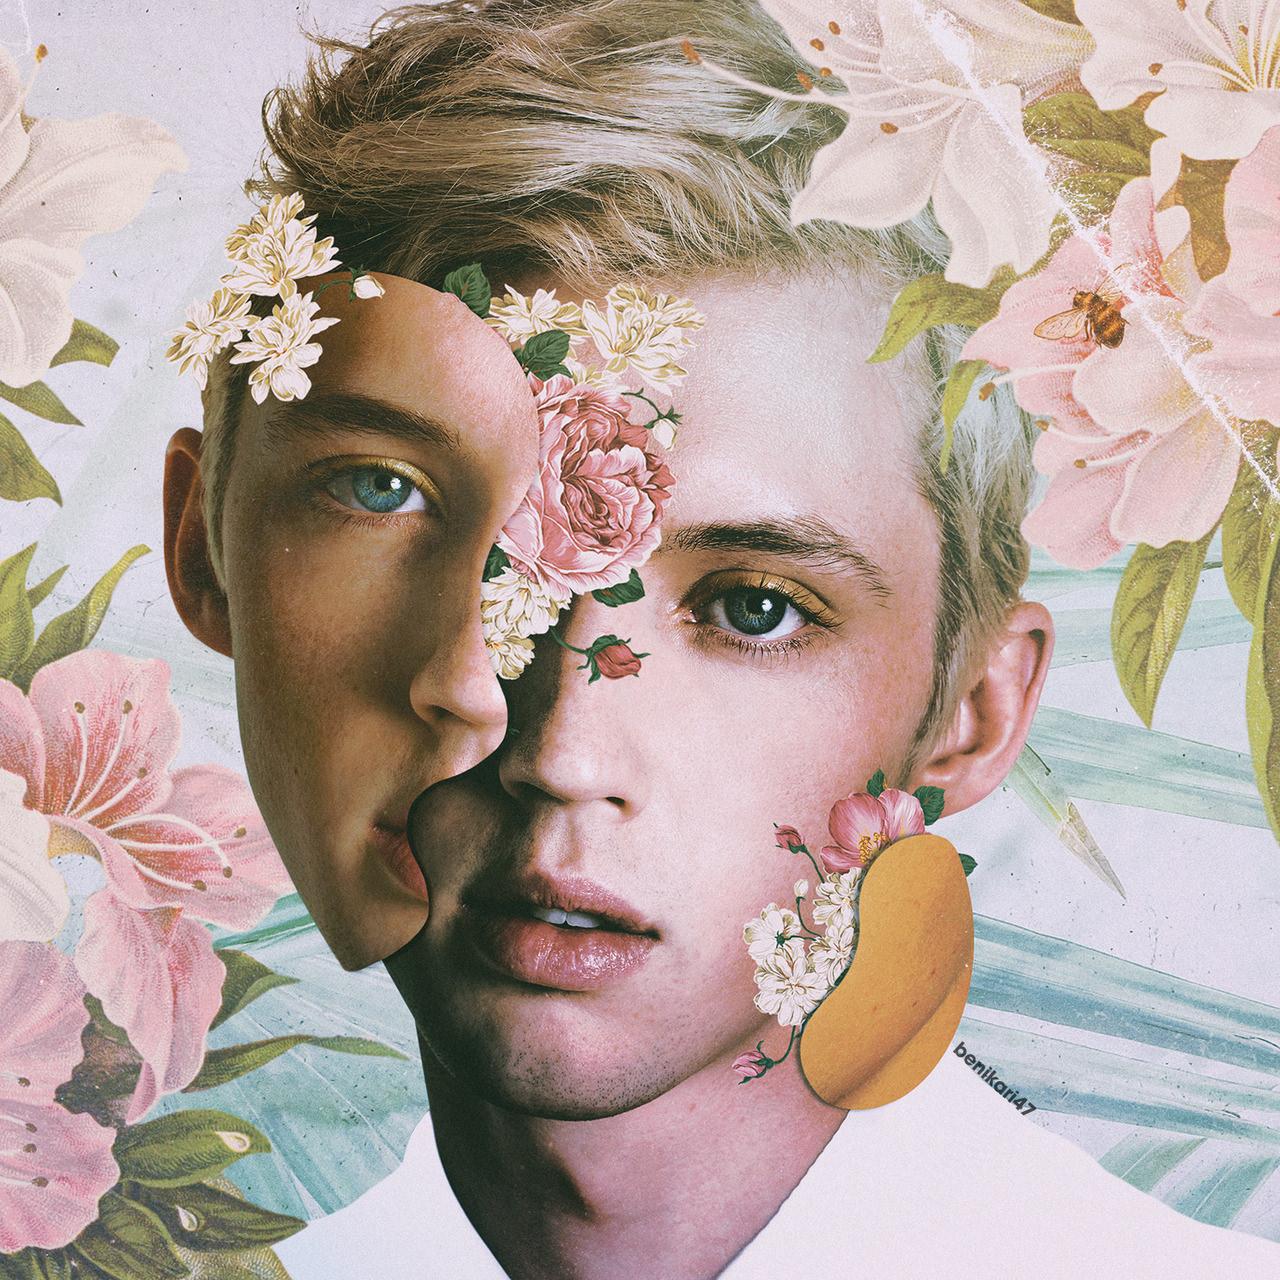 Album troye sivan Bloom (Troye